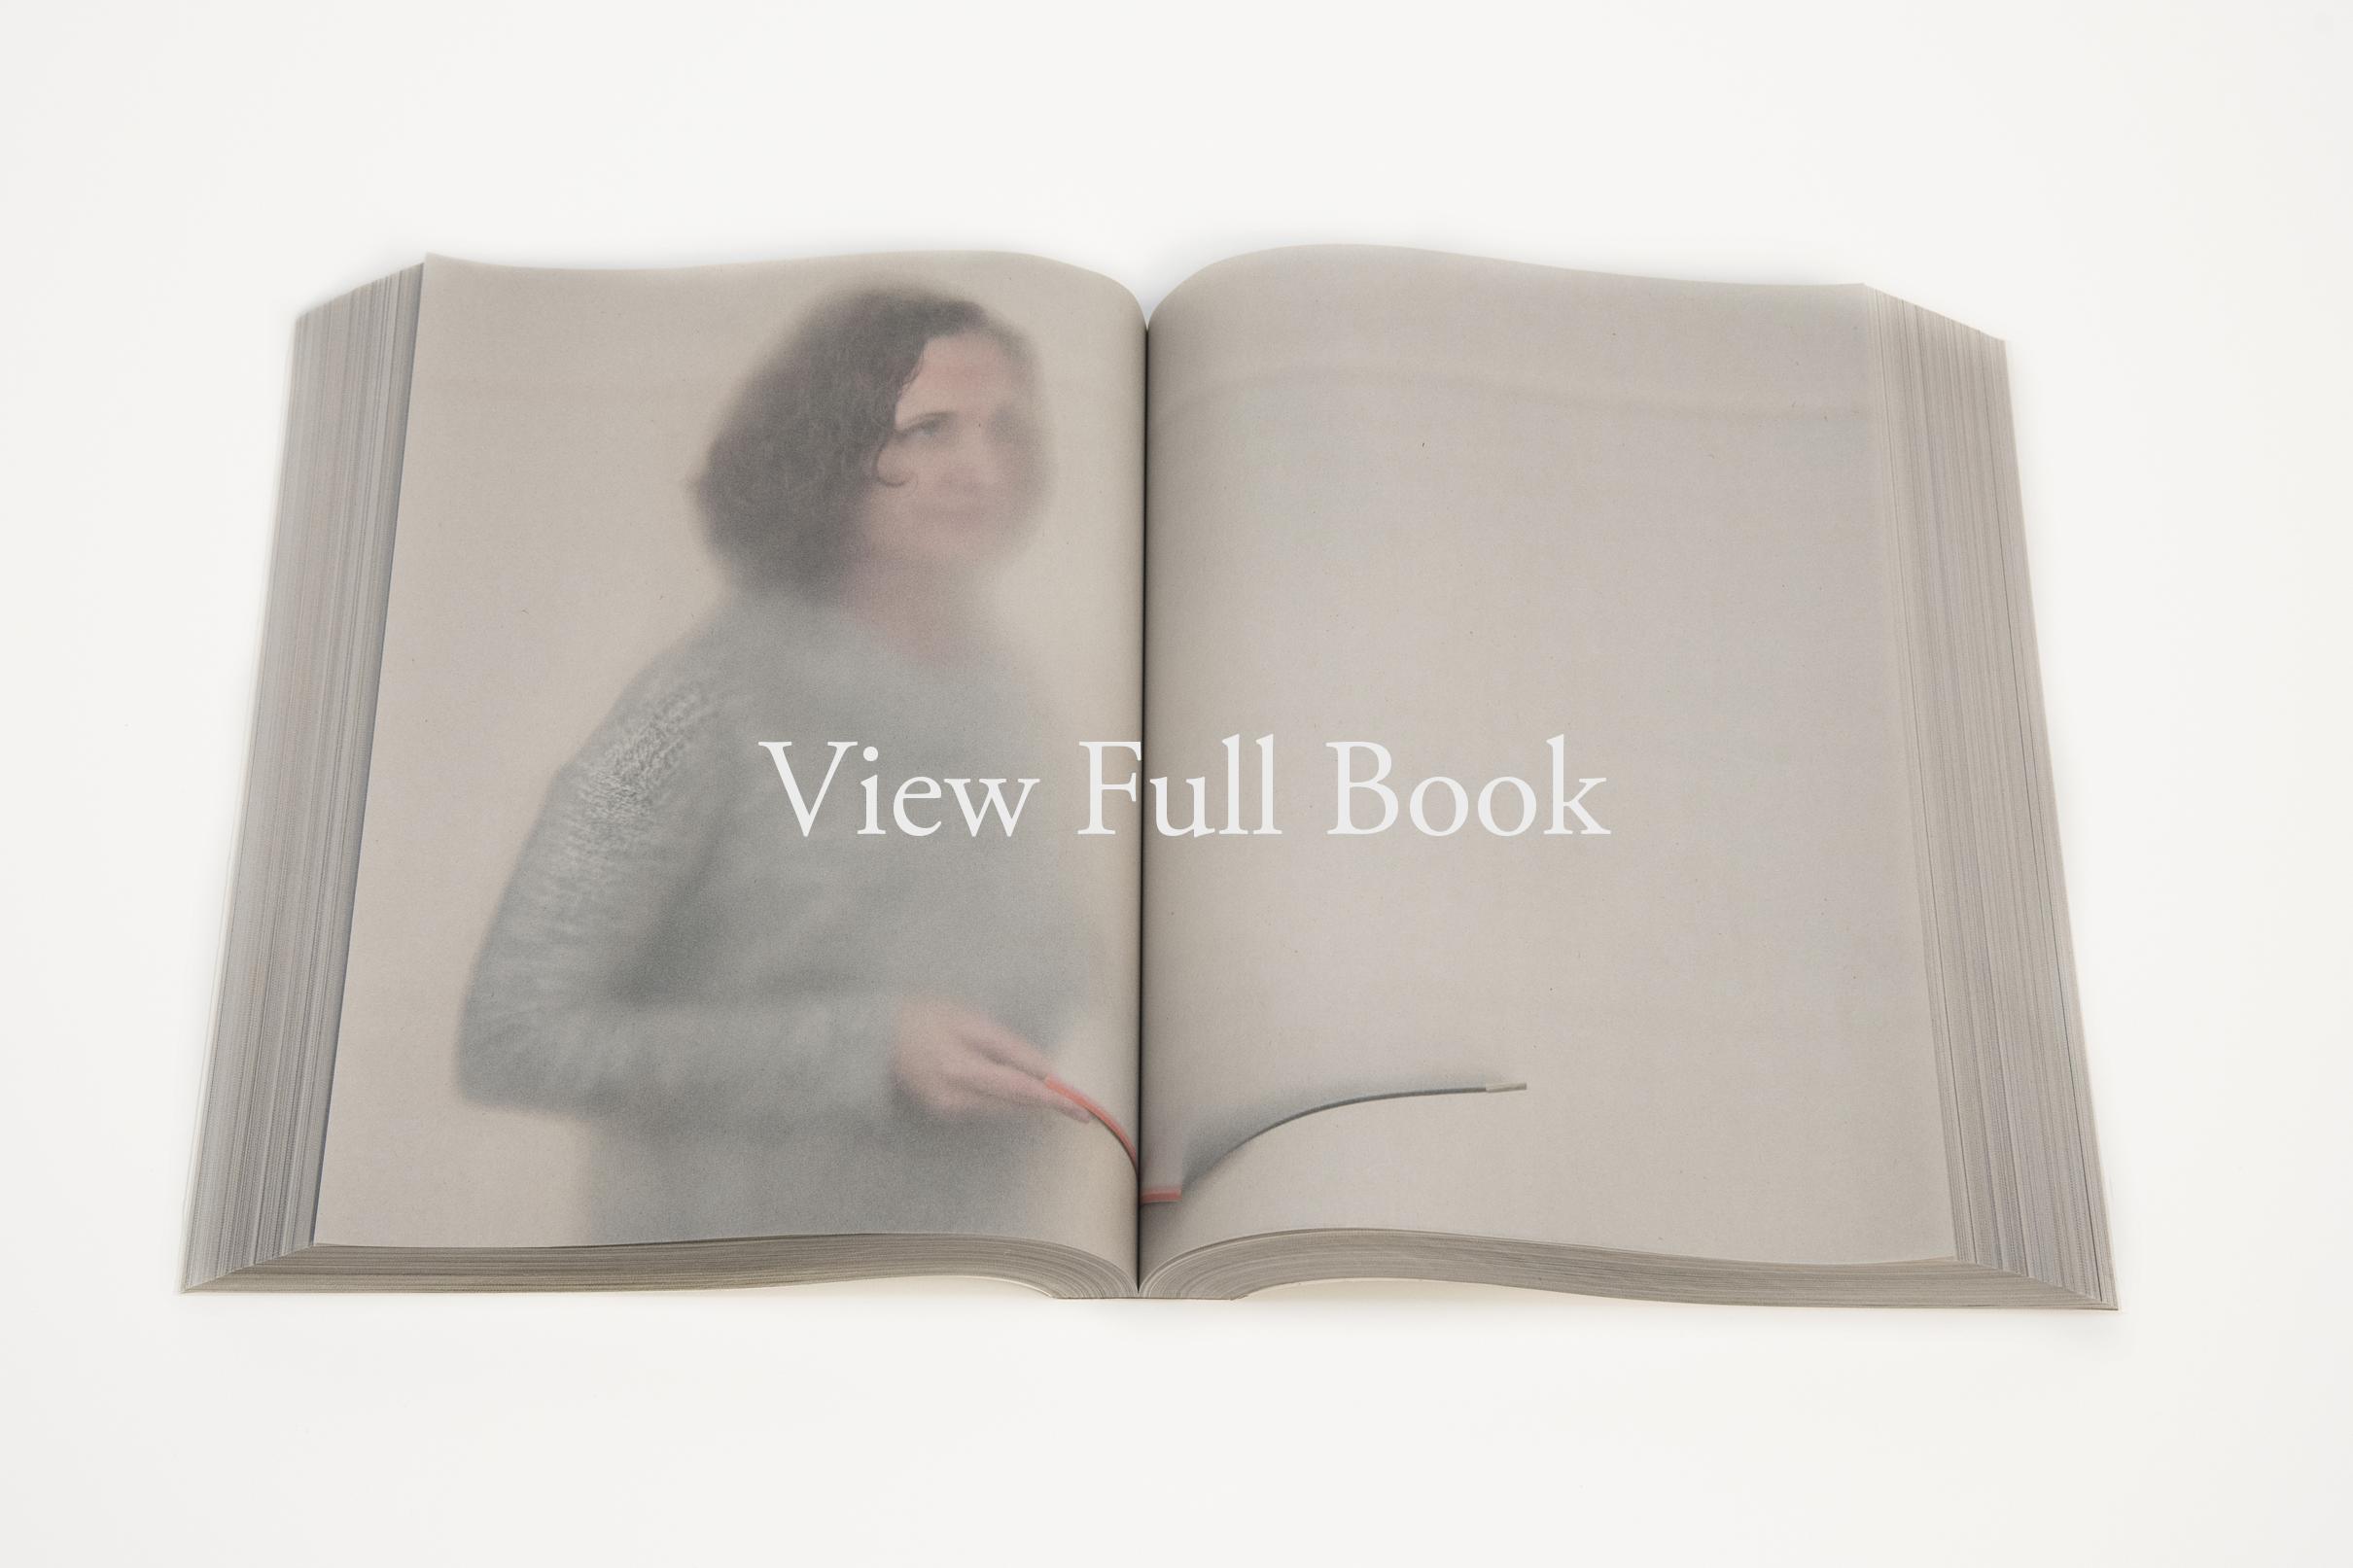 AH_ONEEVERYONE_View_Full_Book